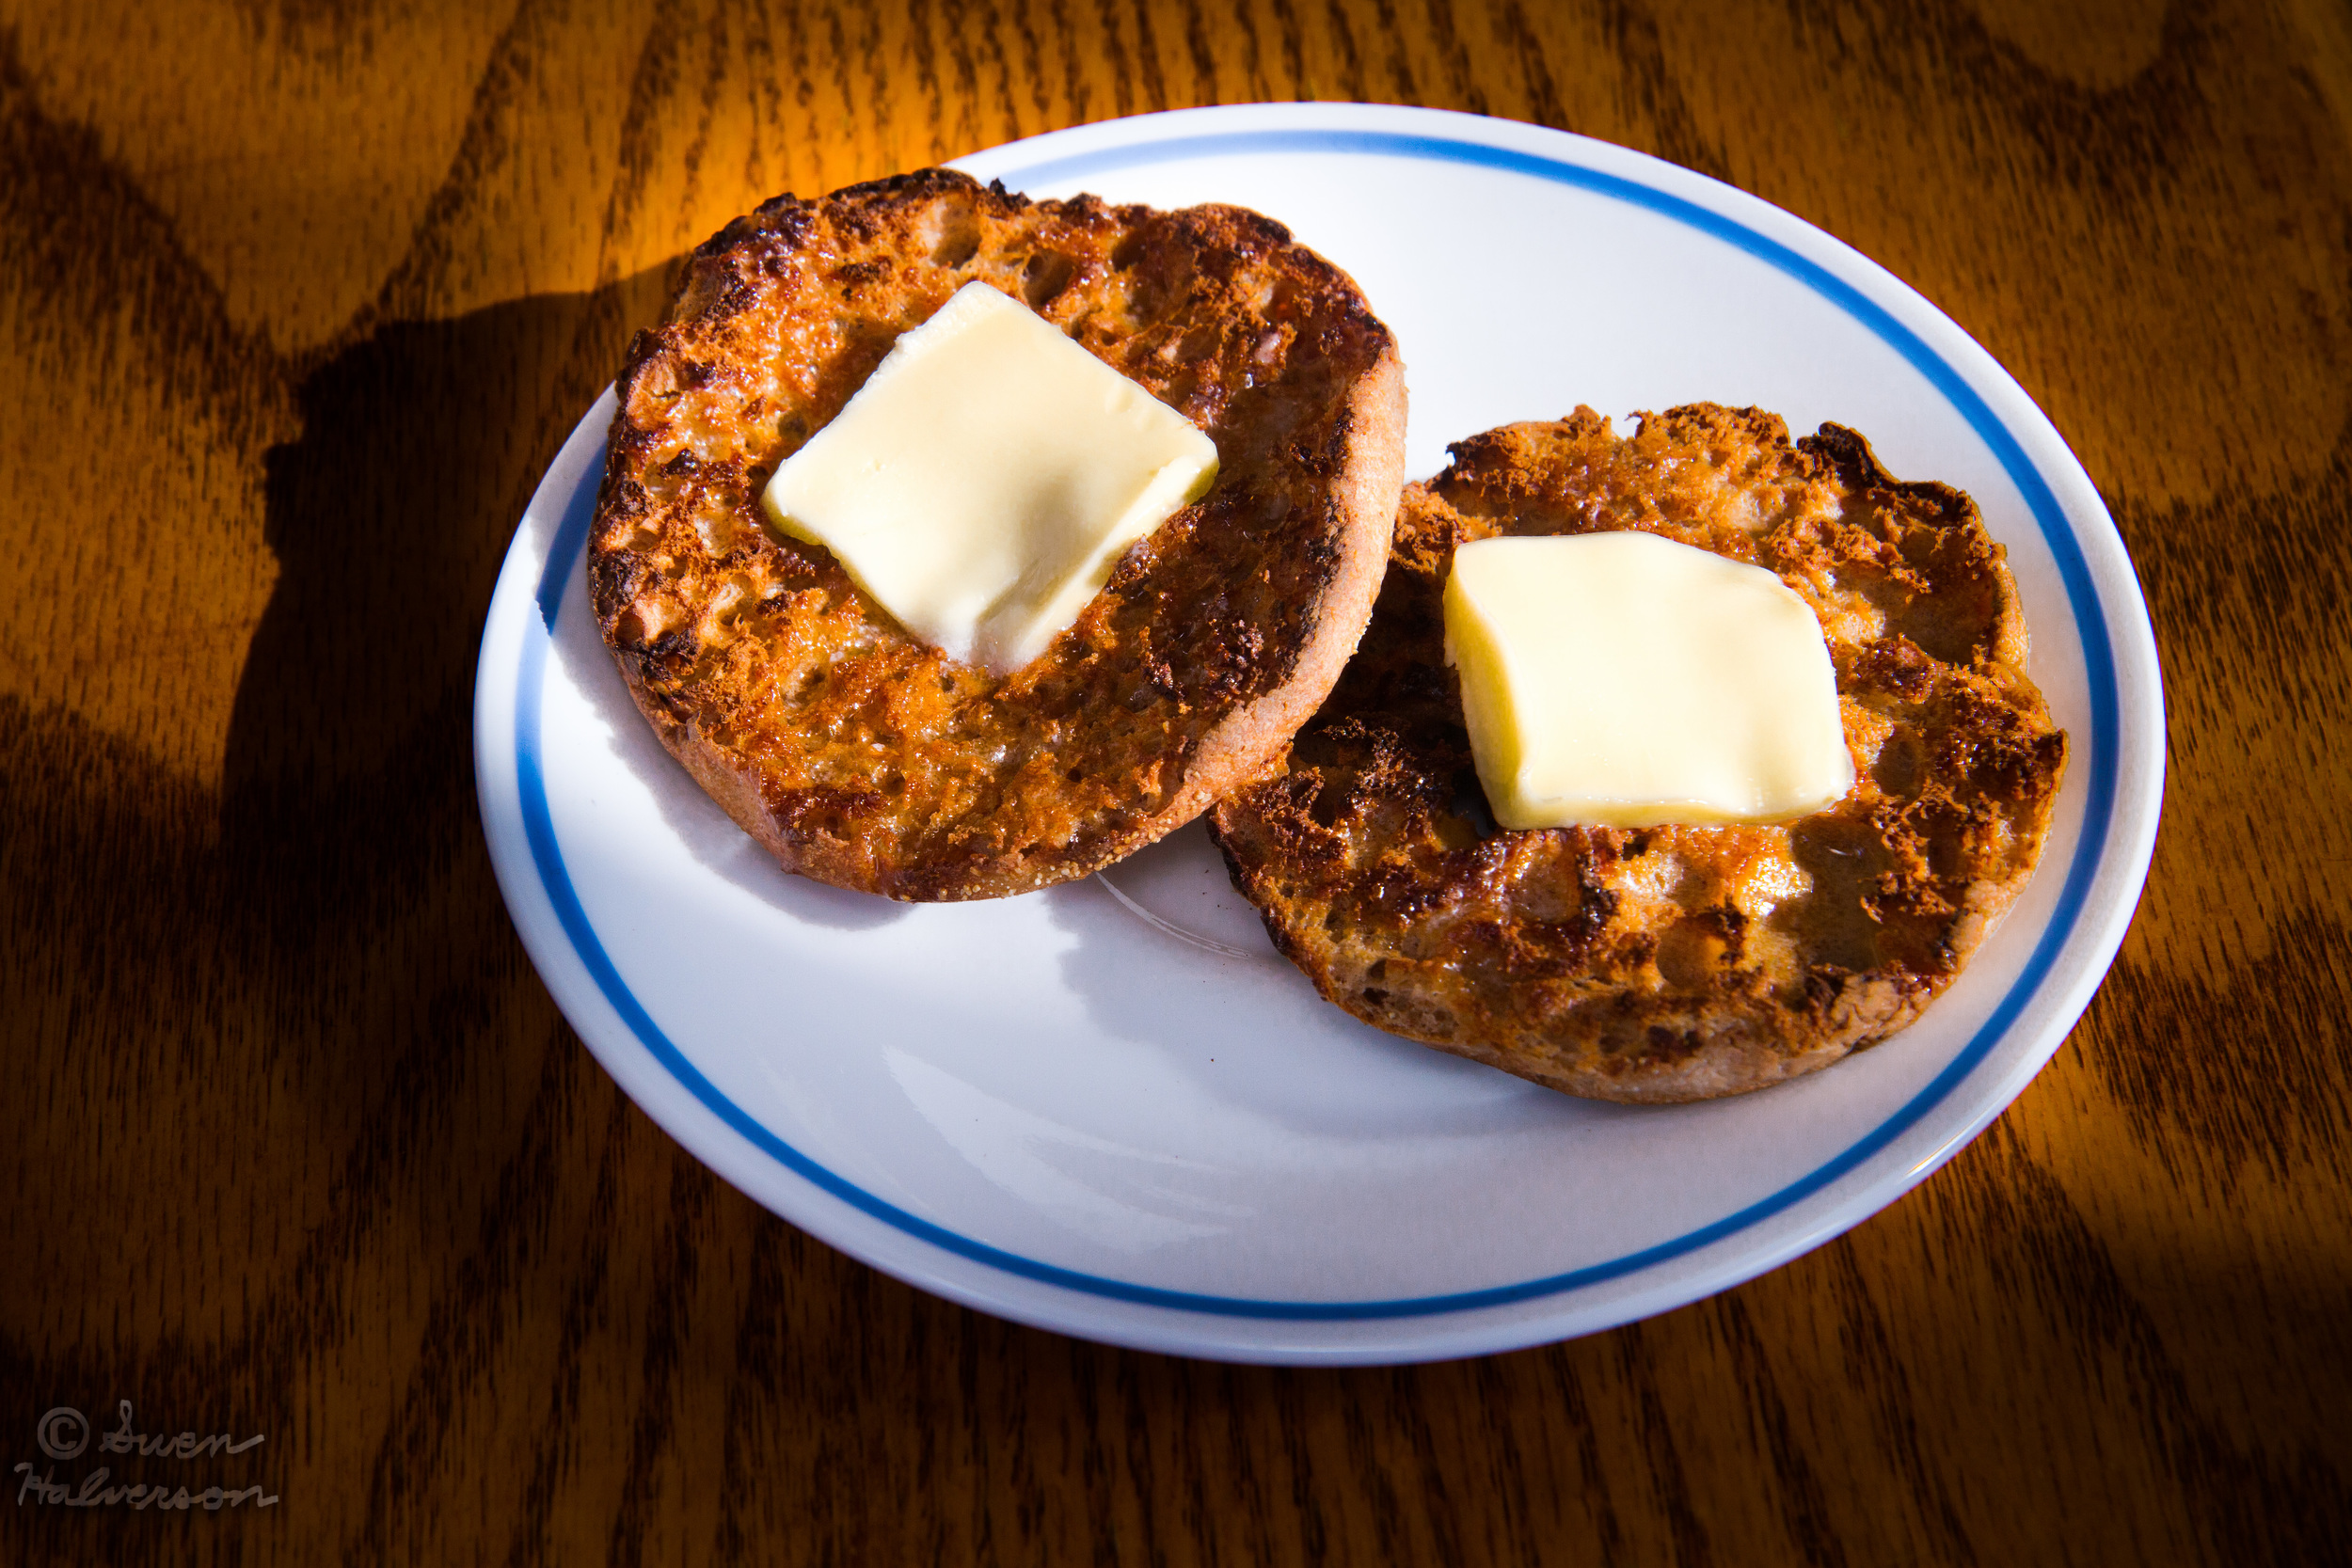 Theme: Oil <br>Title: English Muffin 1